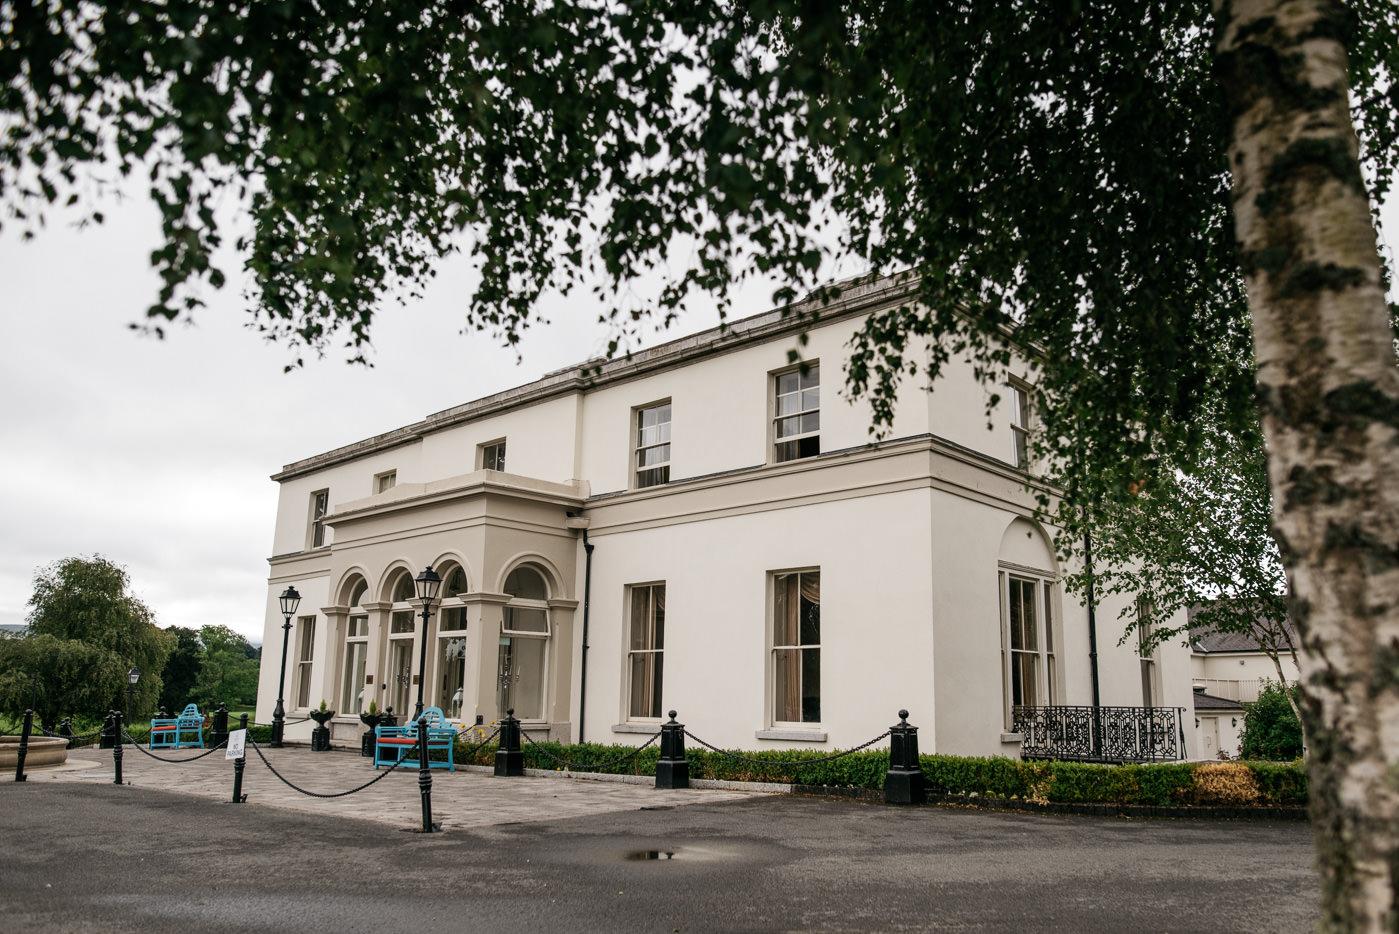 Tulfarris Manor House in Blesington